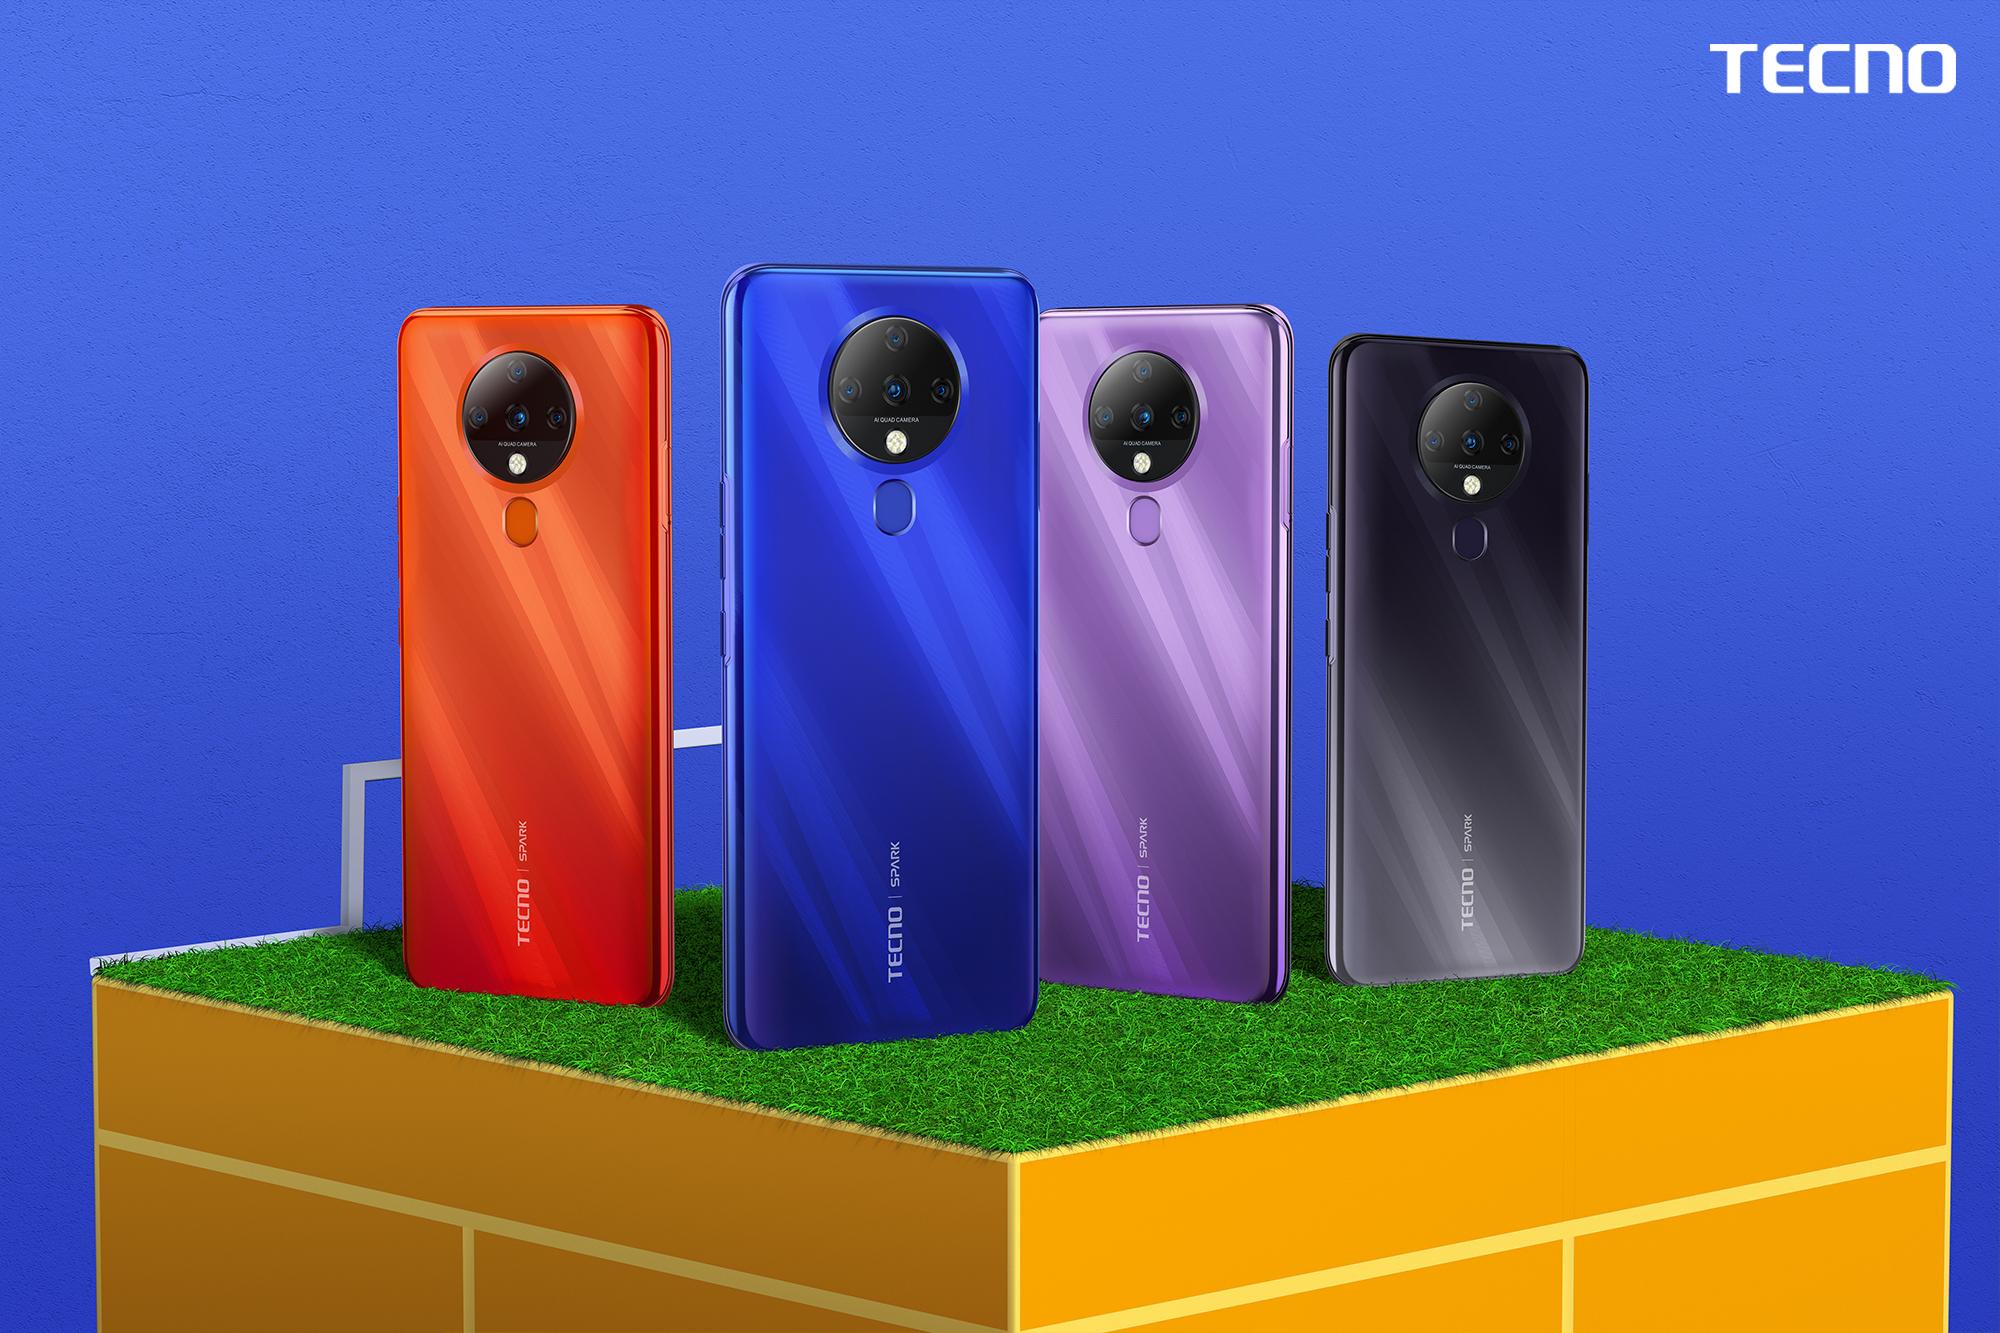 هاتف تكنو موبايل الجديد Spark 6